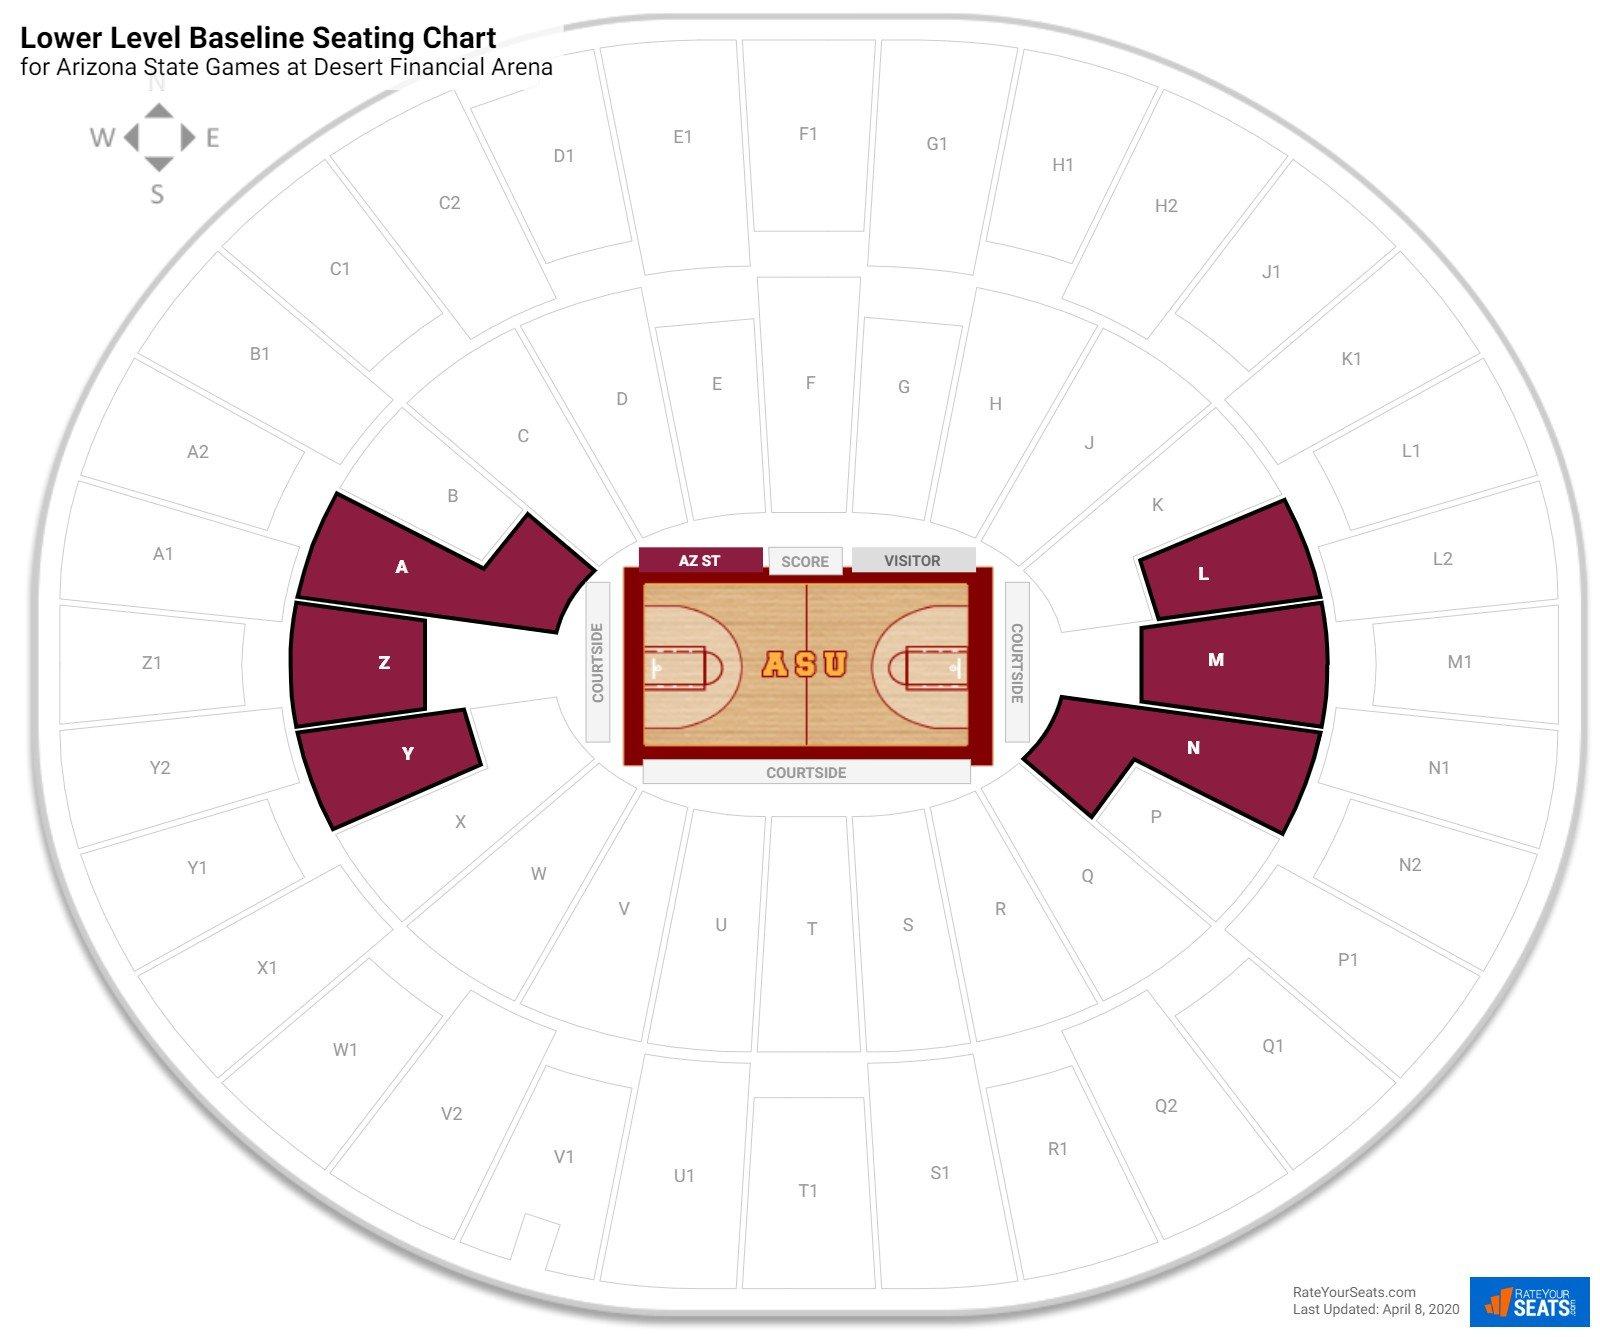 Wells Fargo Arena Arizona State Seating Guide